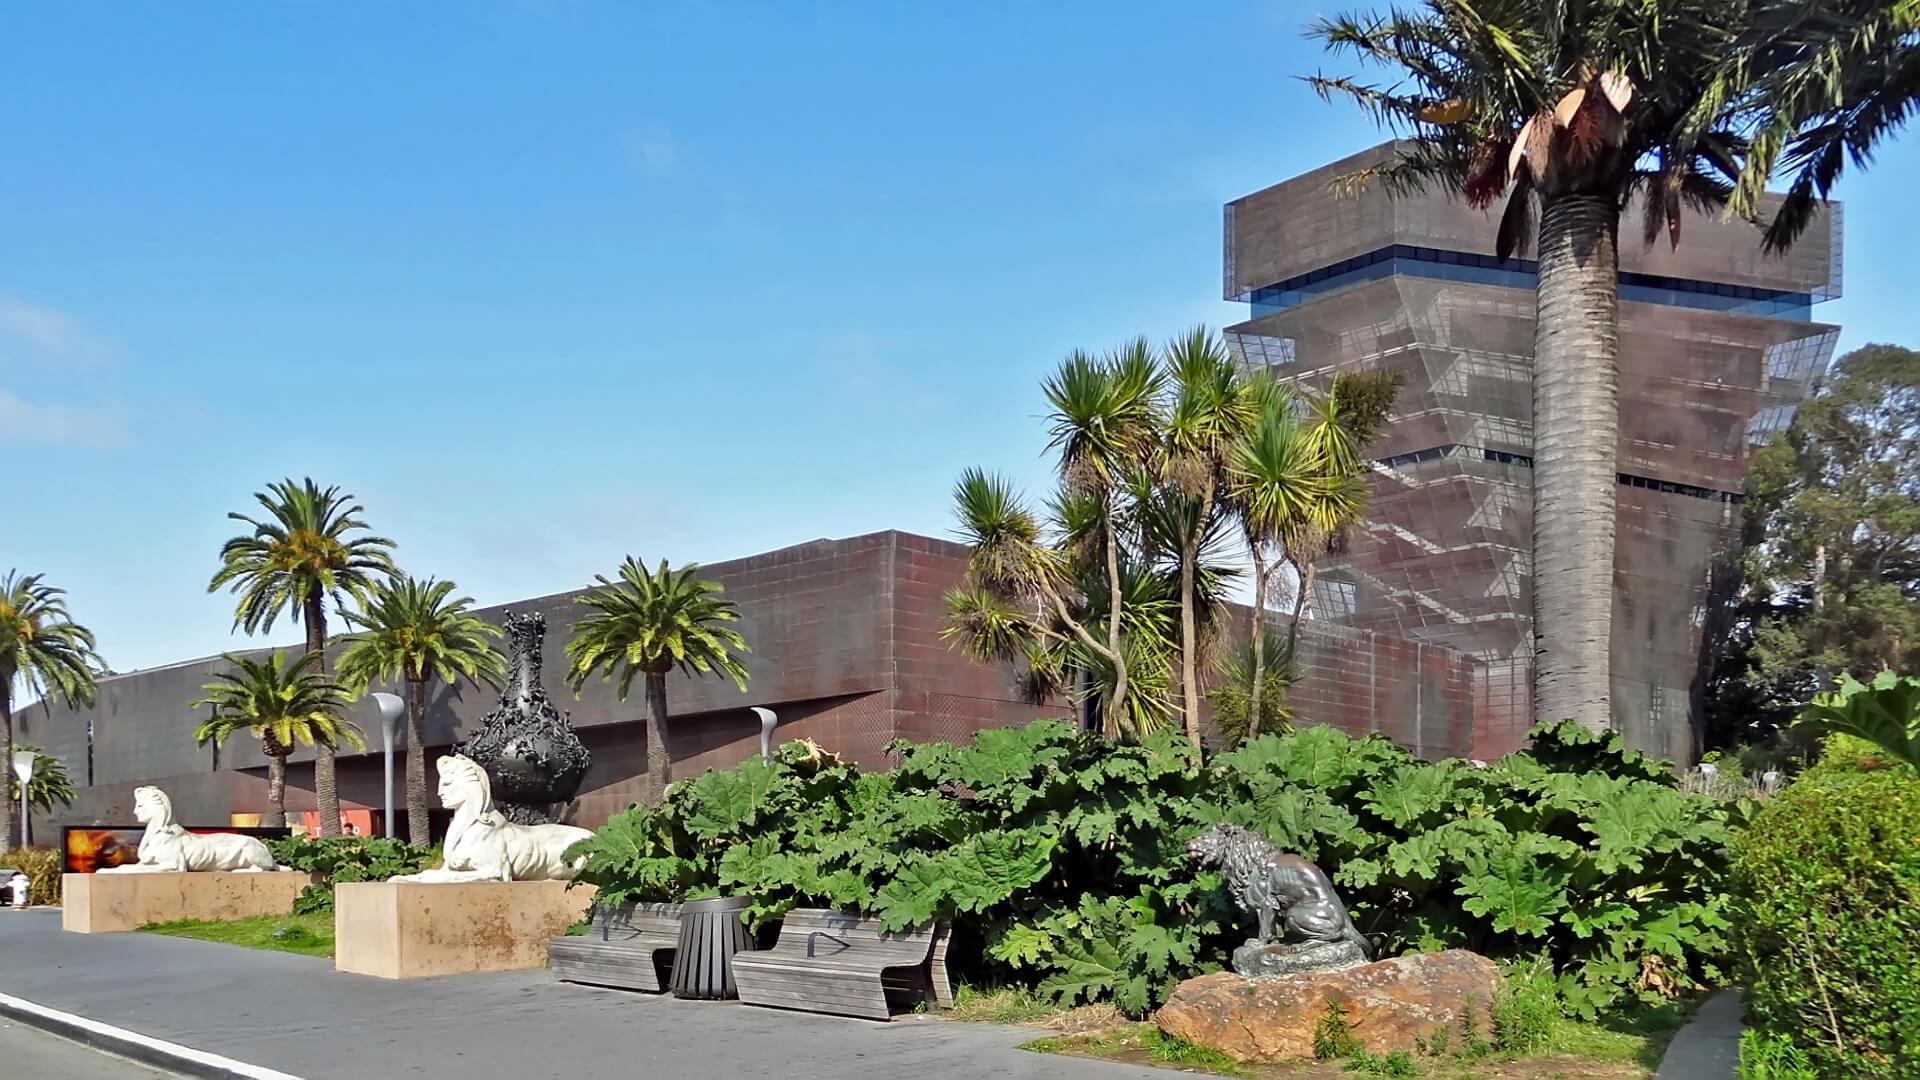 de Young Museum - Museus em San Francisco